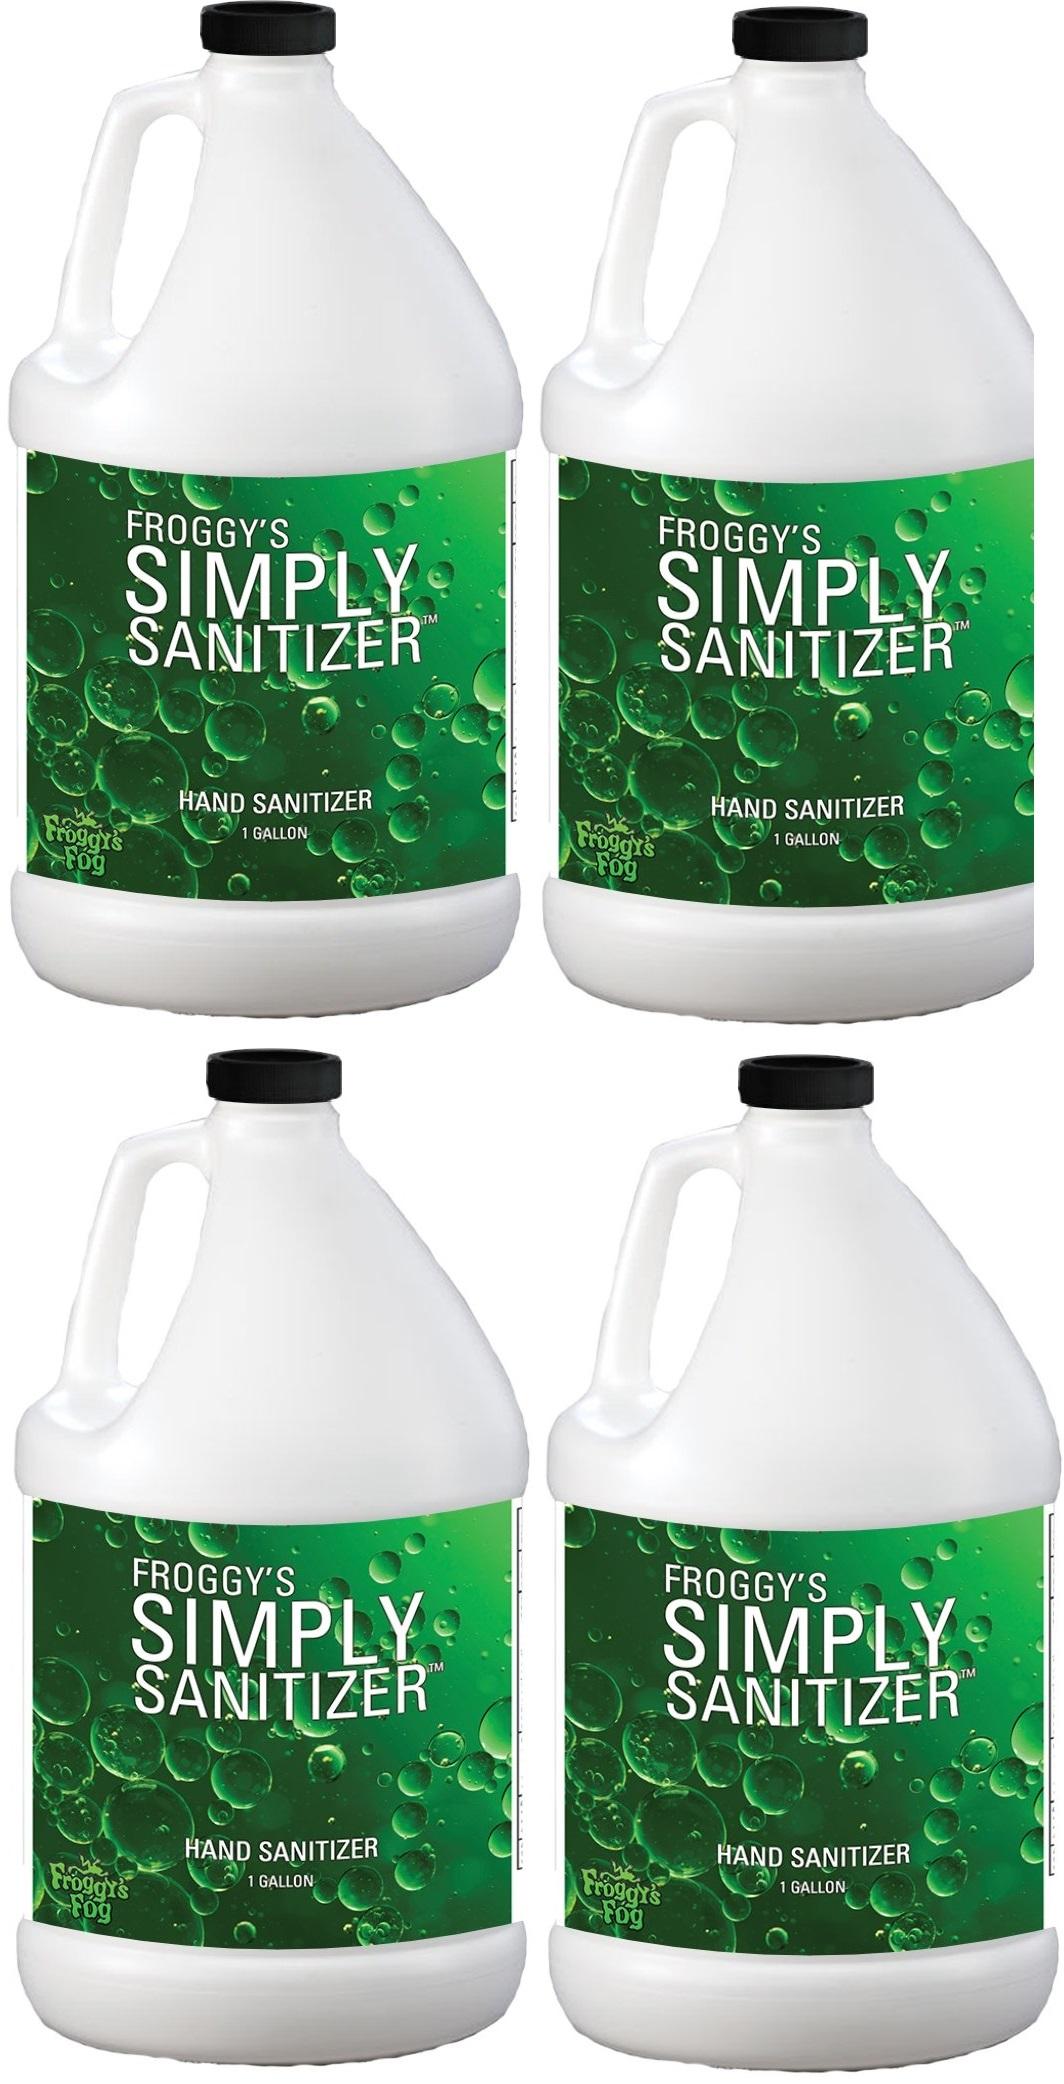 froggys-fog-simply-sanitize---hand-sanitizer-4-gallons.jpeg